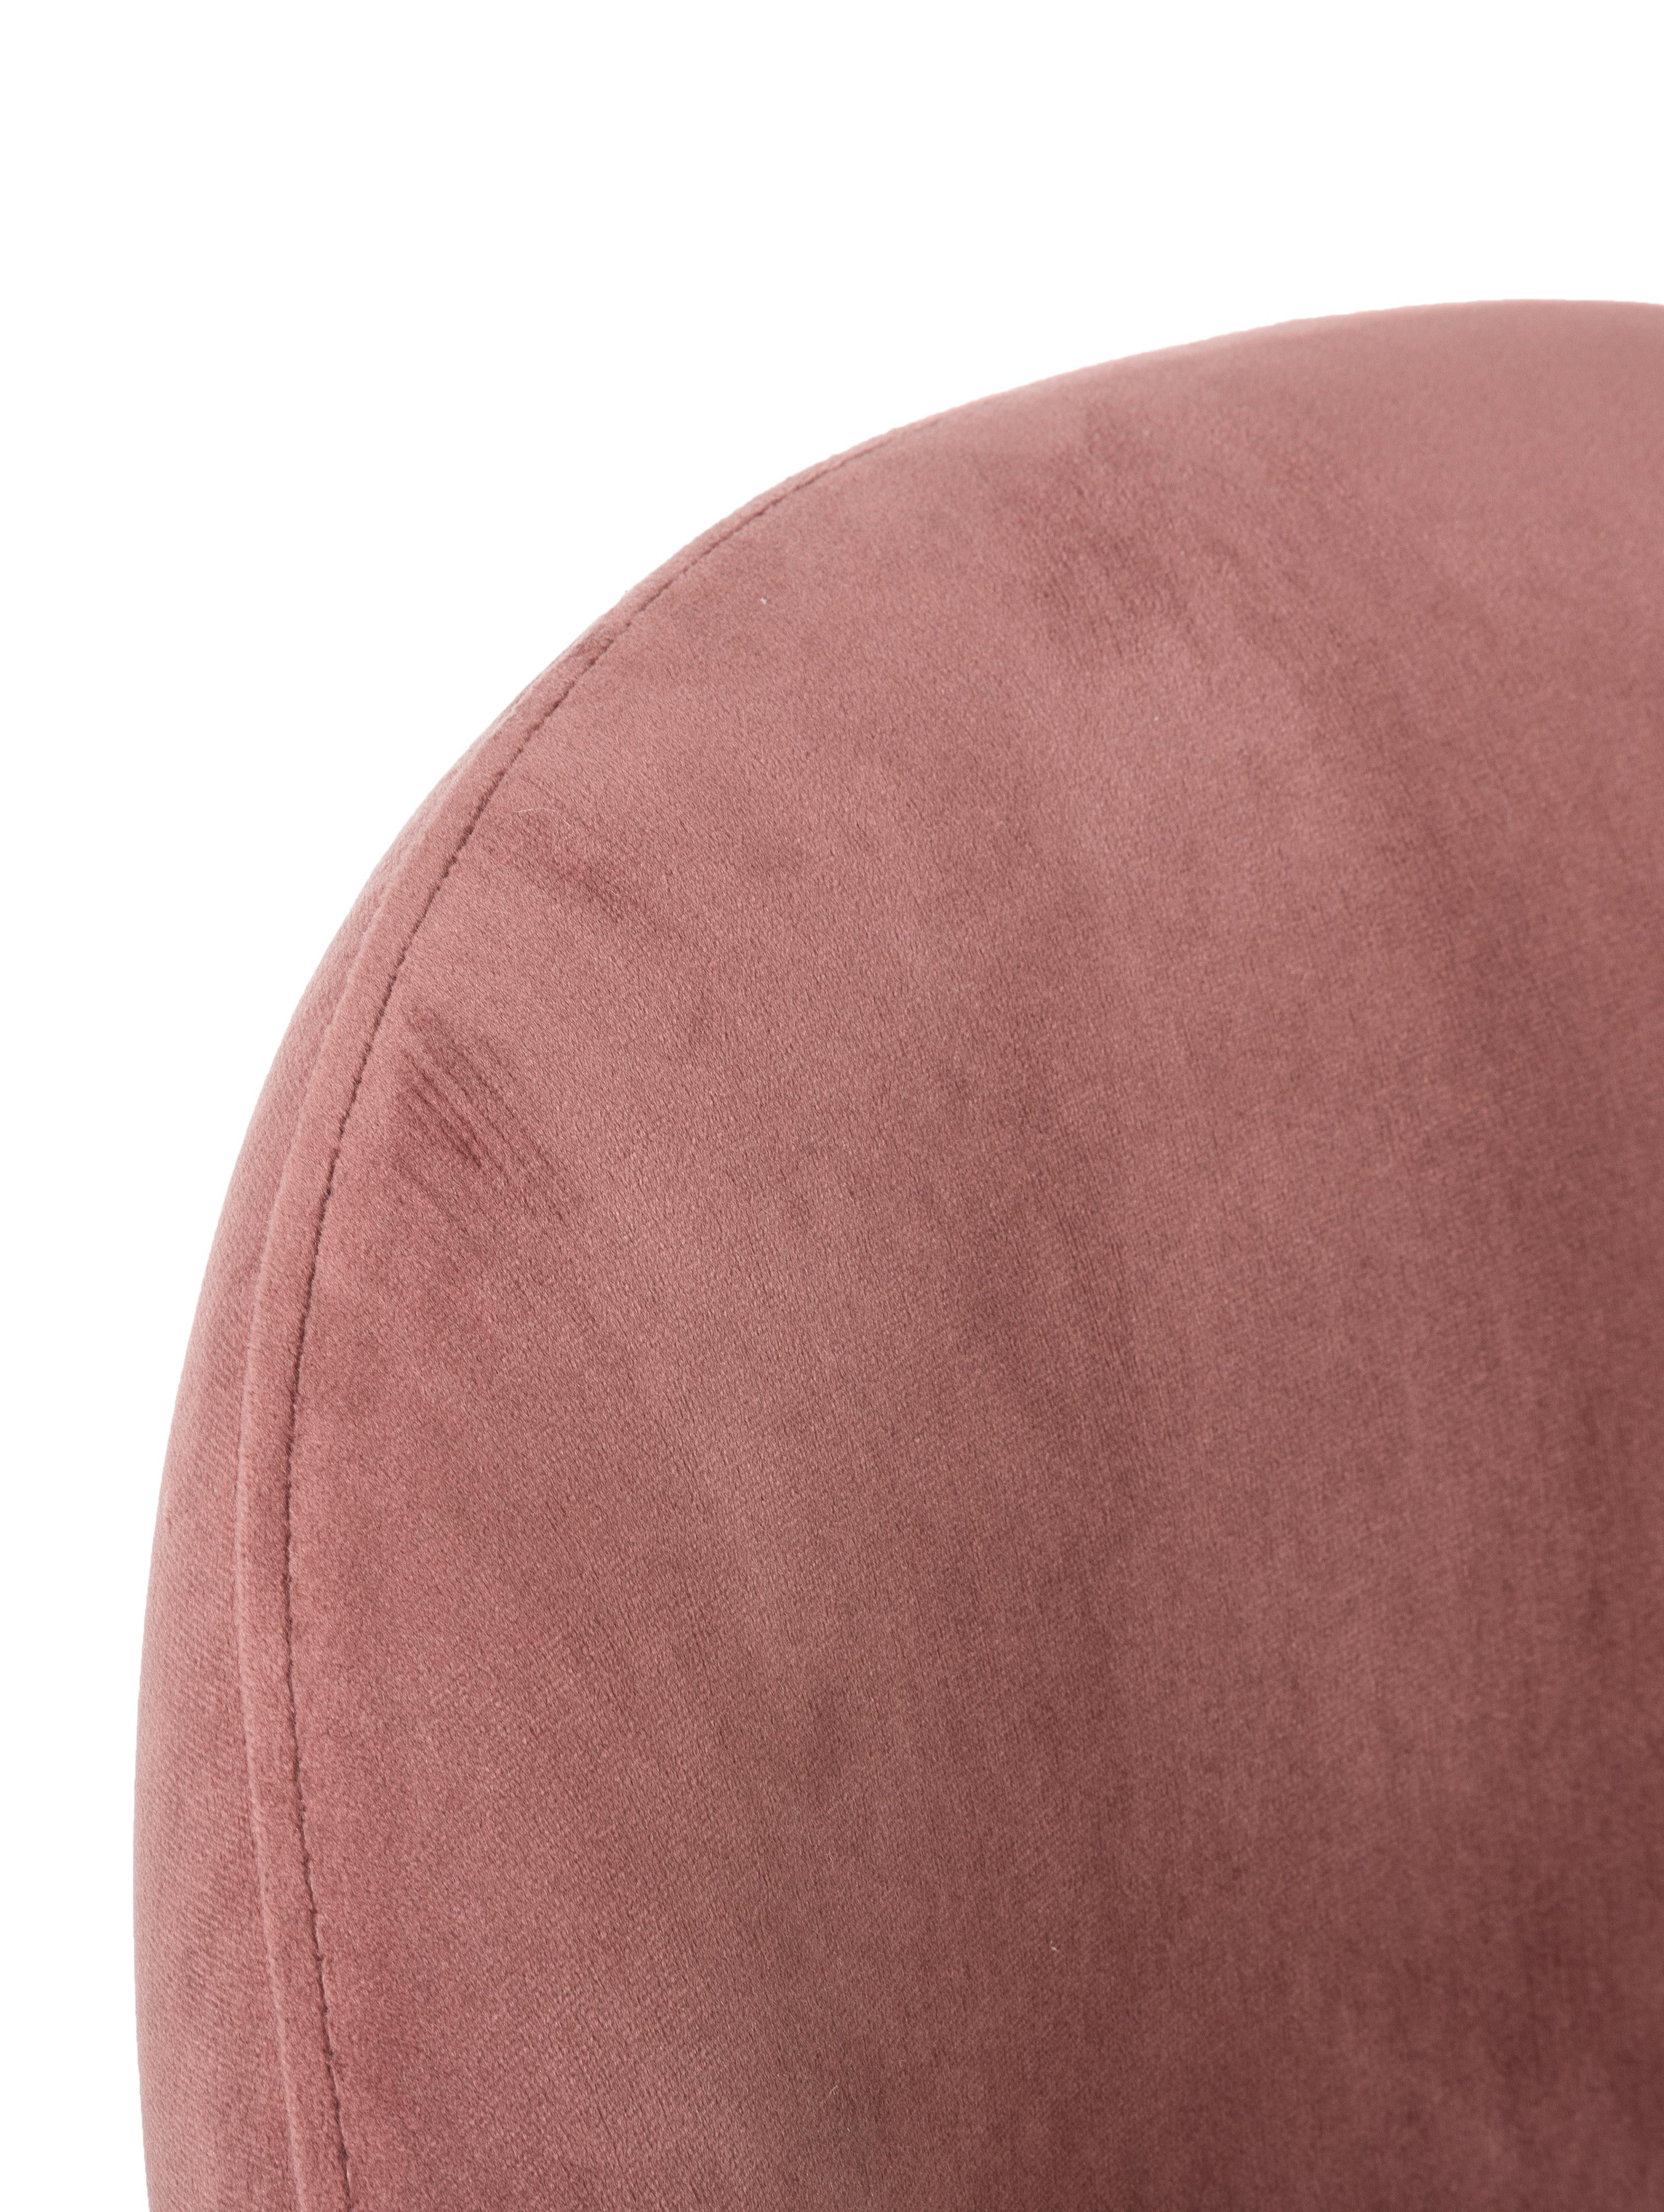 Samt-Polsterstuhl Rachel, Bezug: Samt (Hochwertiger Polyes, Beine: Metall, pulverbeschichtet, Samt Altrosa, B 53 x T 57 cm